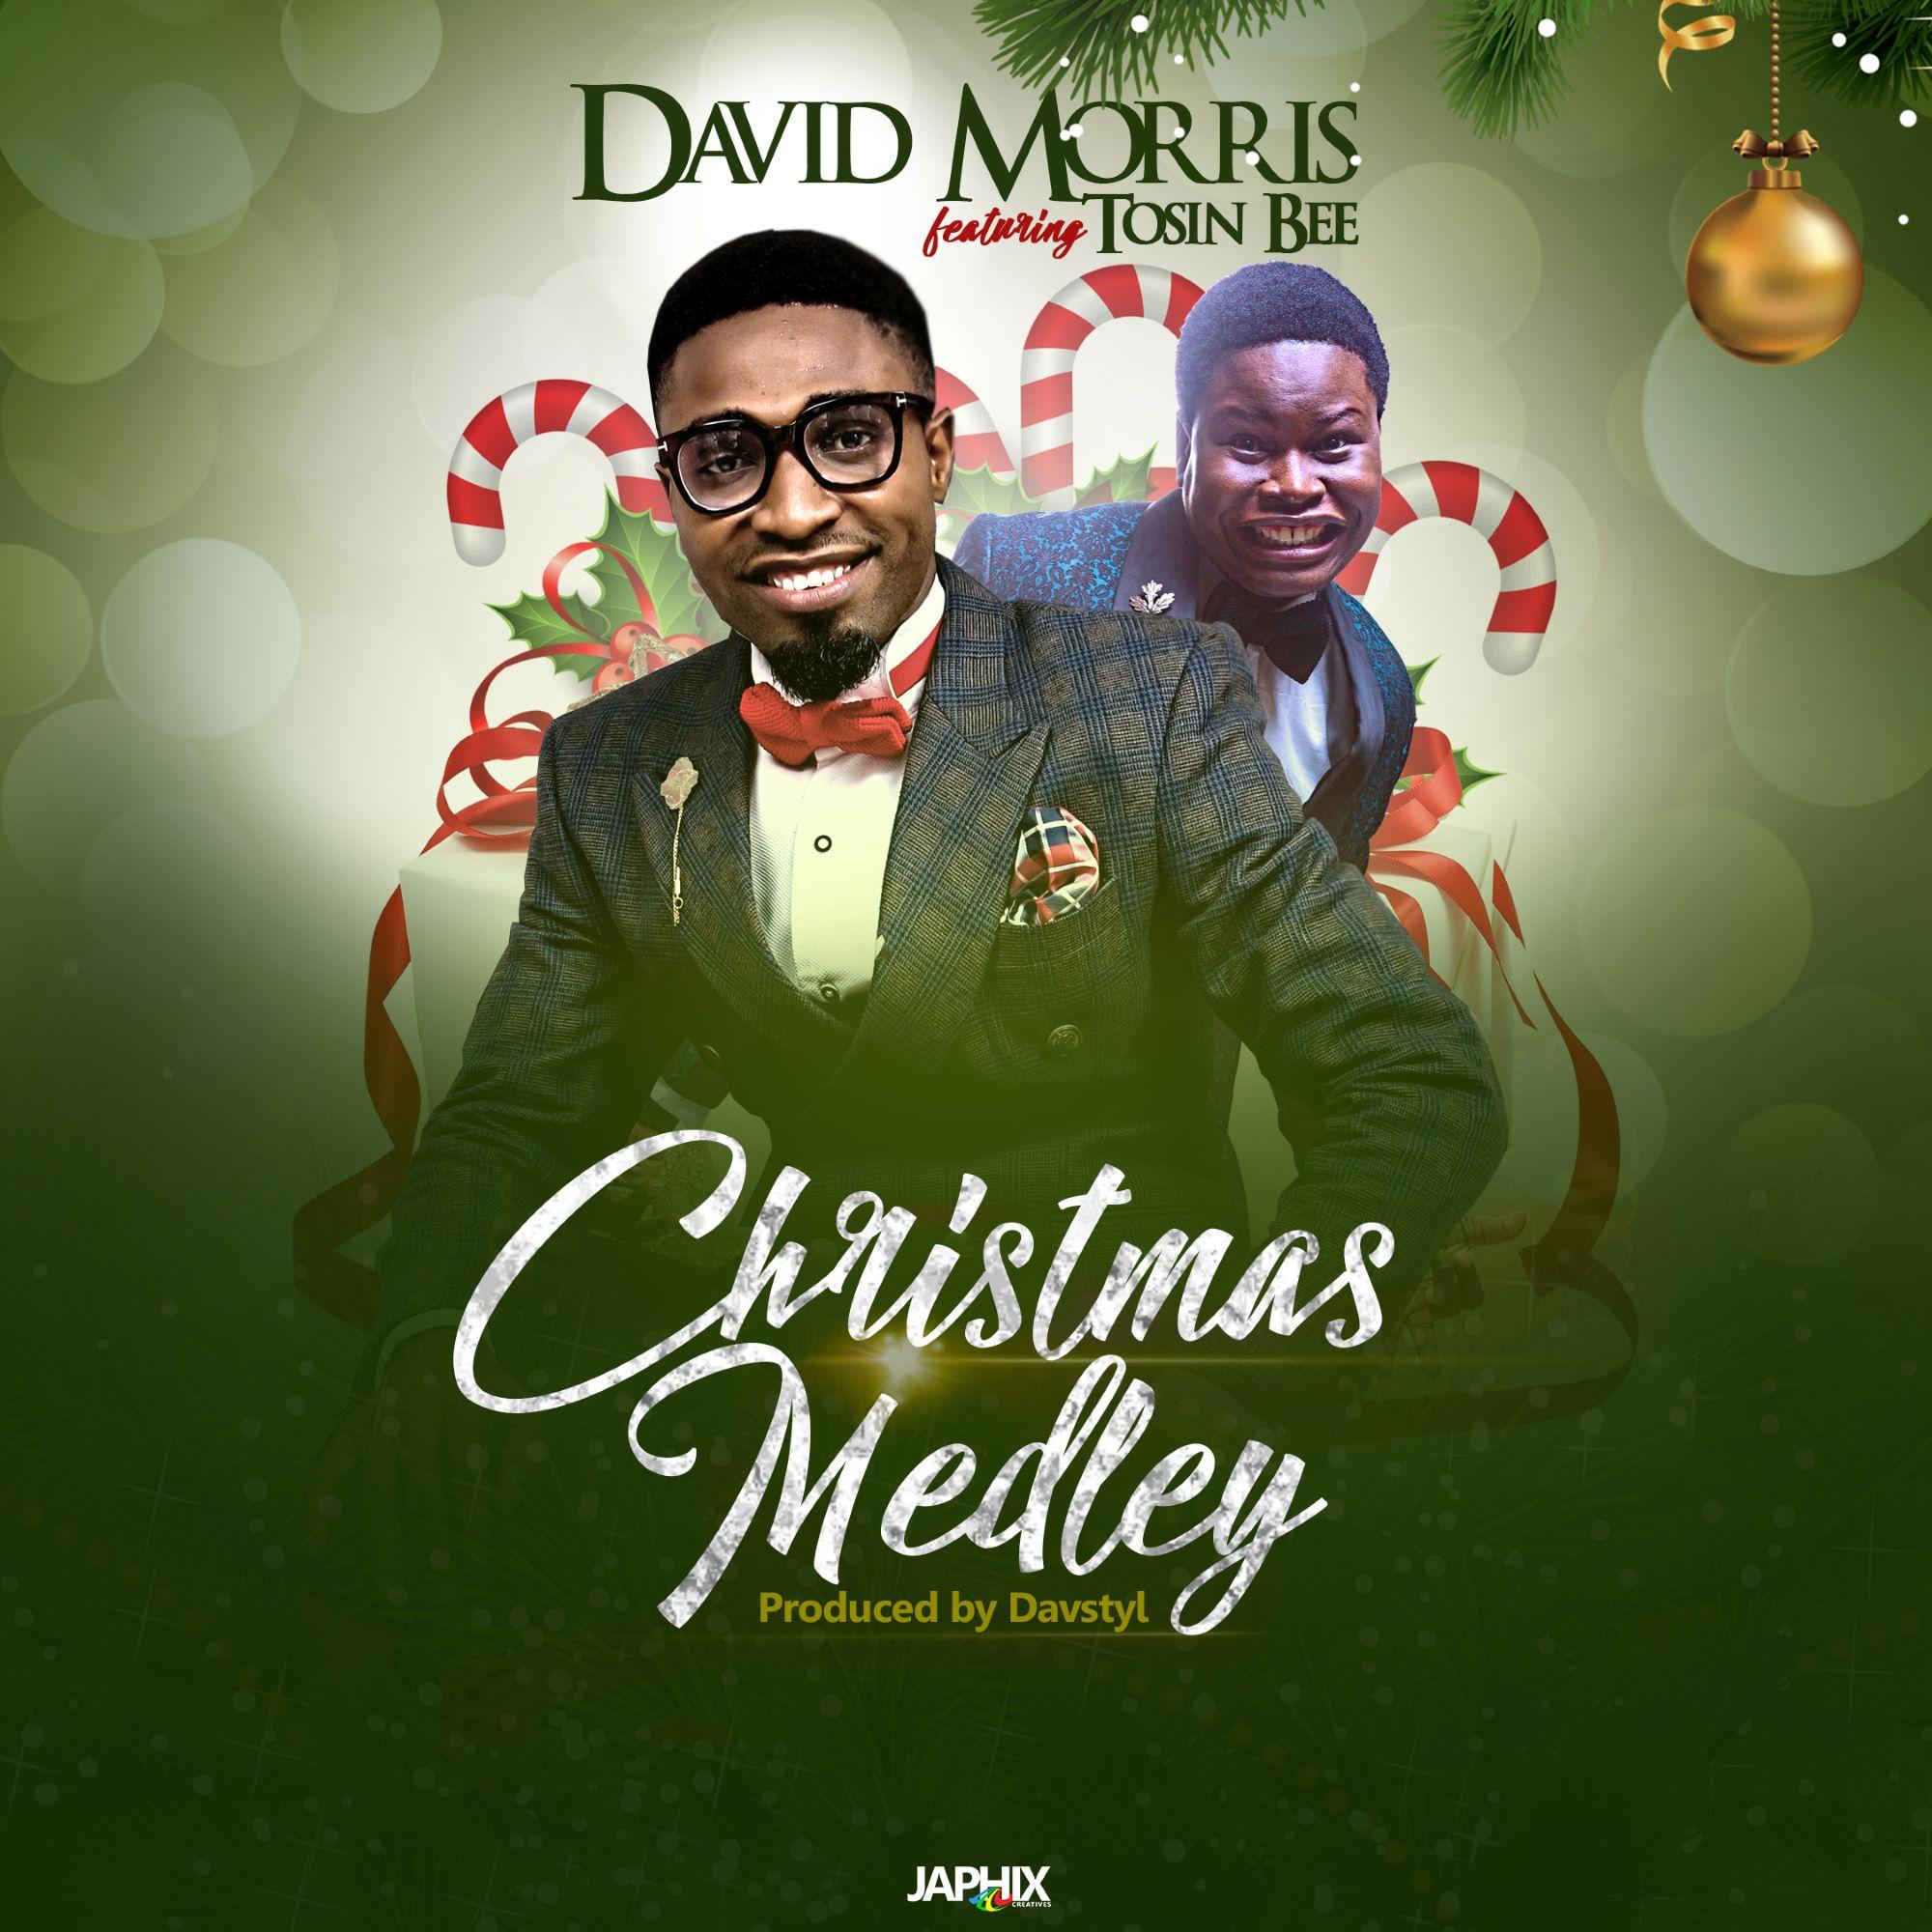 David Morris Christmas Medley